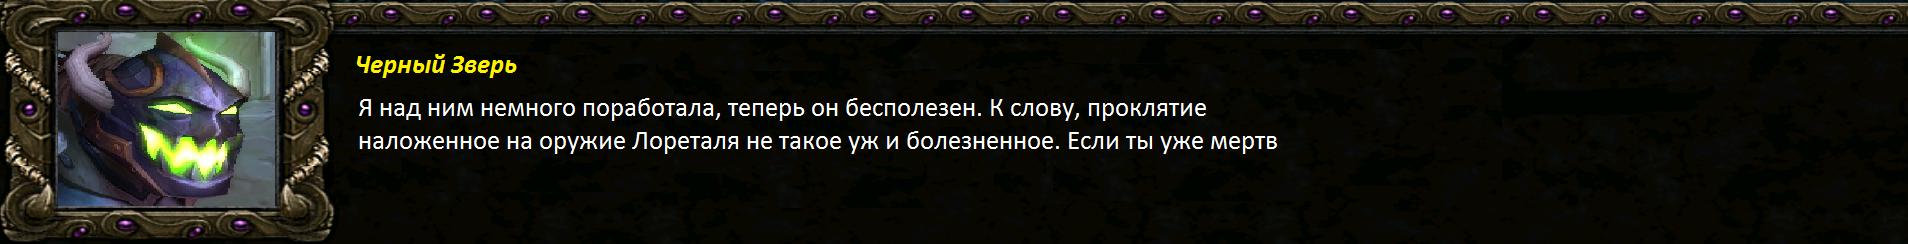 Диалог ДкВар 12 эпизод 07